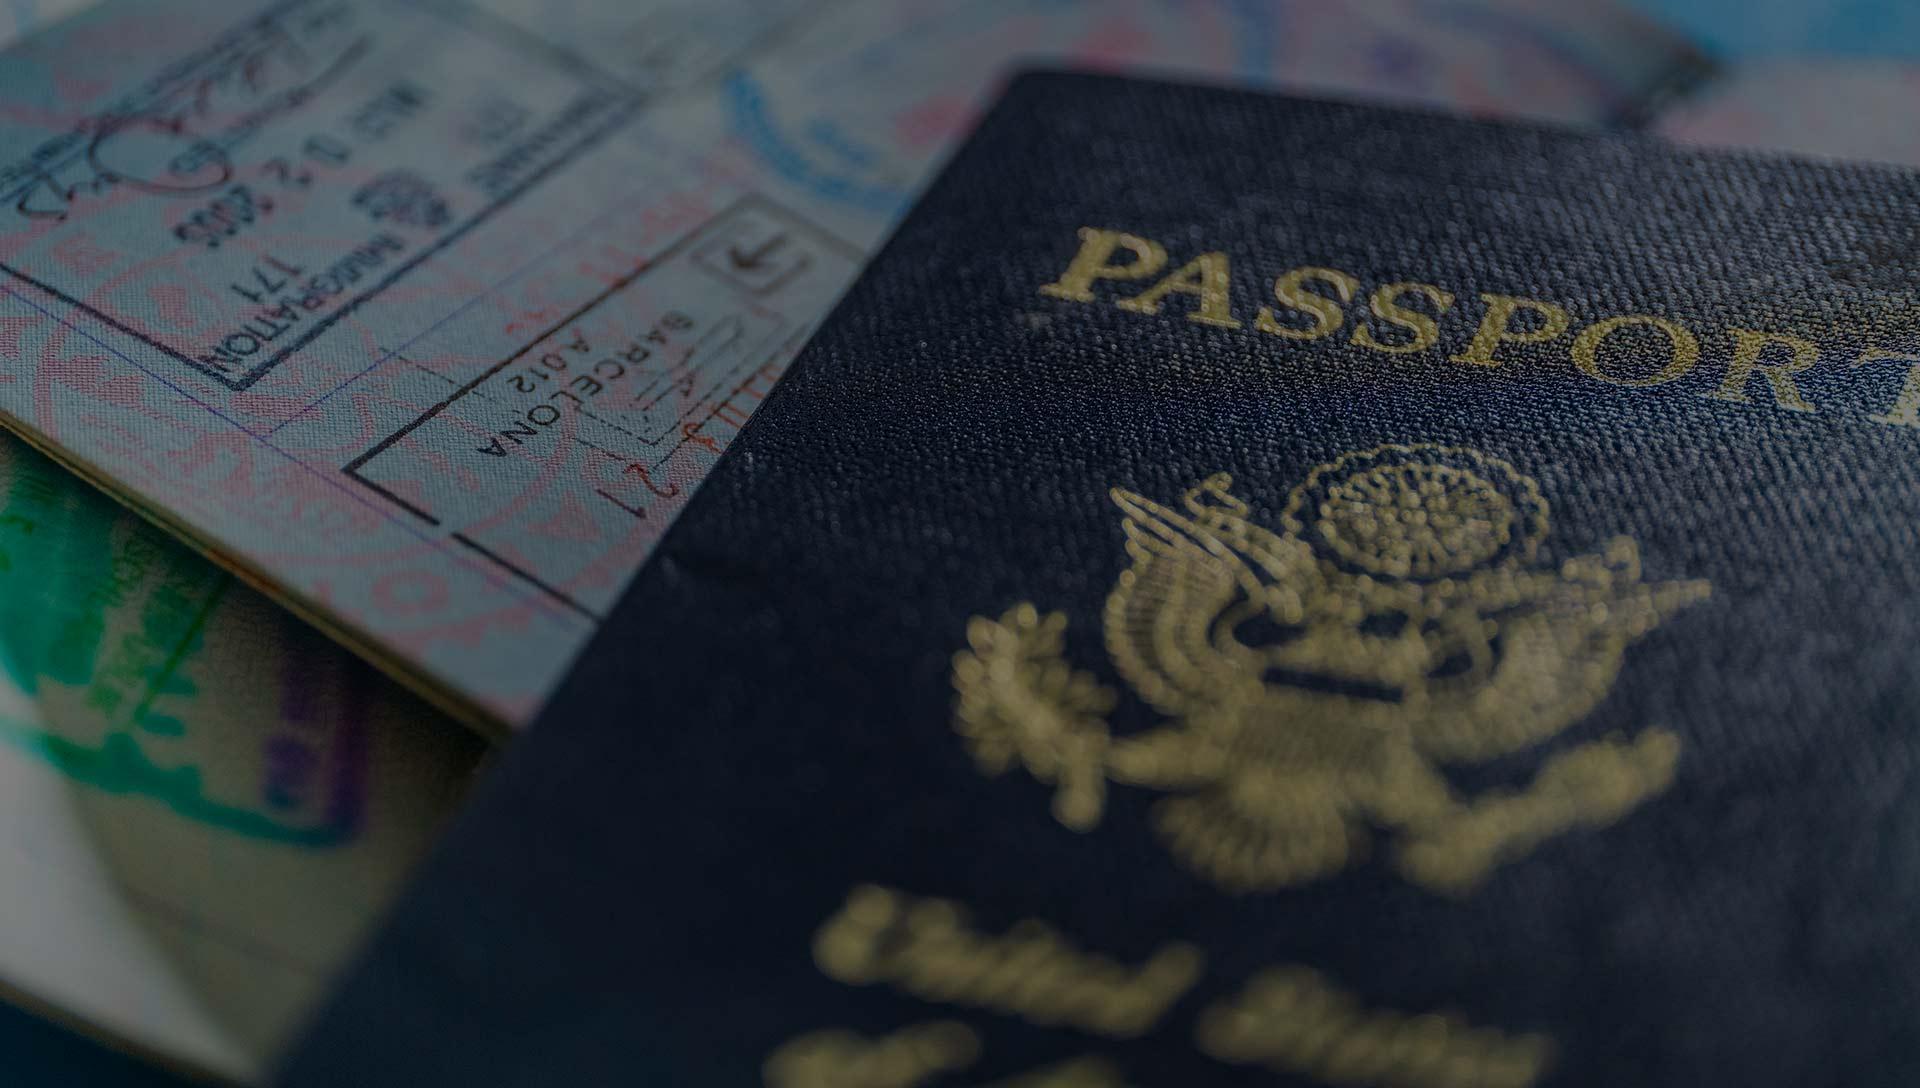 A US passport and passport stamps.